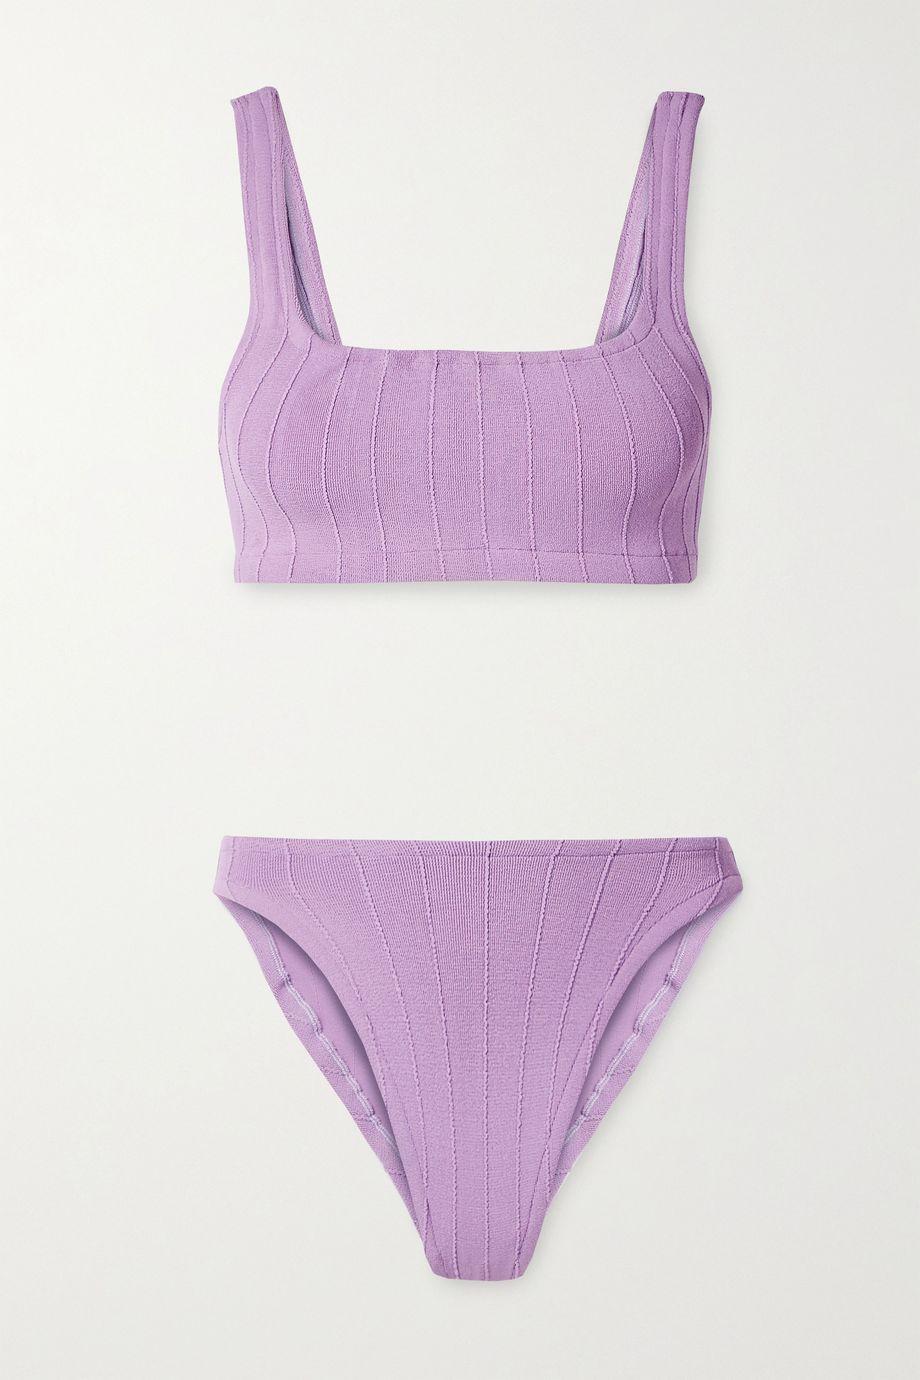 Hunza G + NET SUSTAIN Helena Nile ribbed bikini